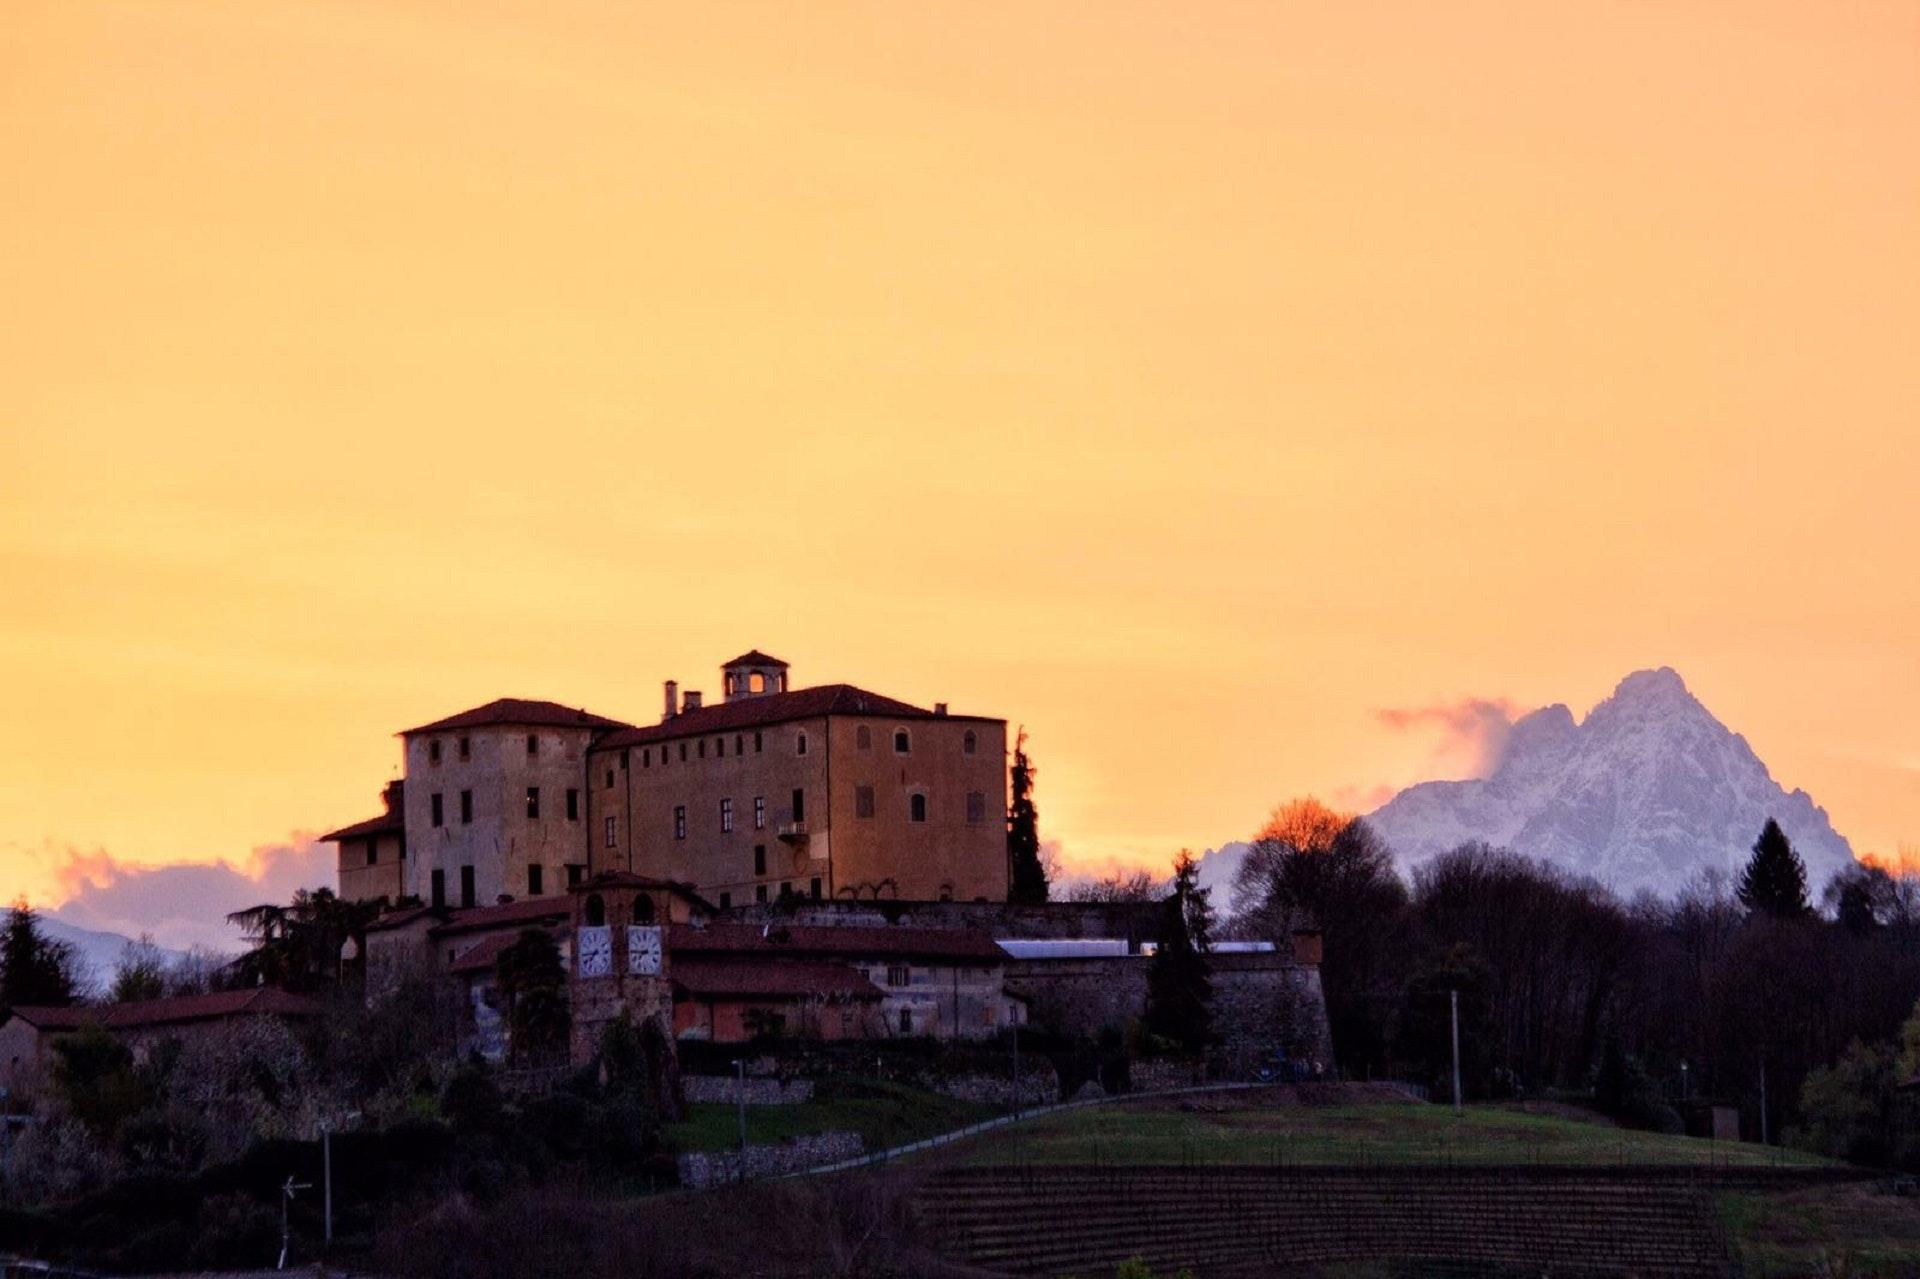 Castello della Manta, CASTELLO DELLA MANTA, MANTA (CN )